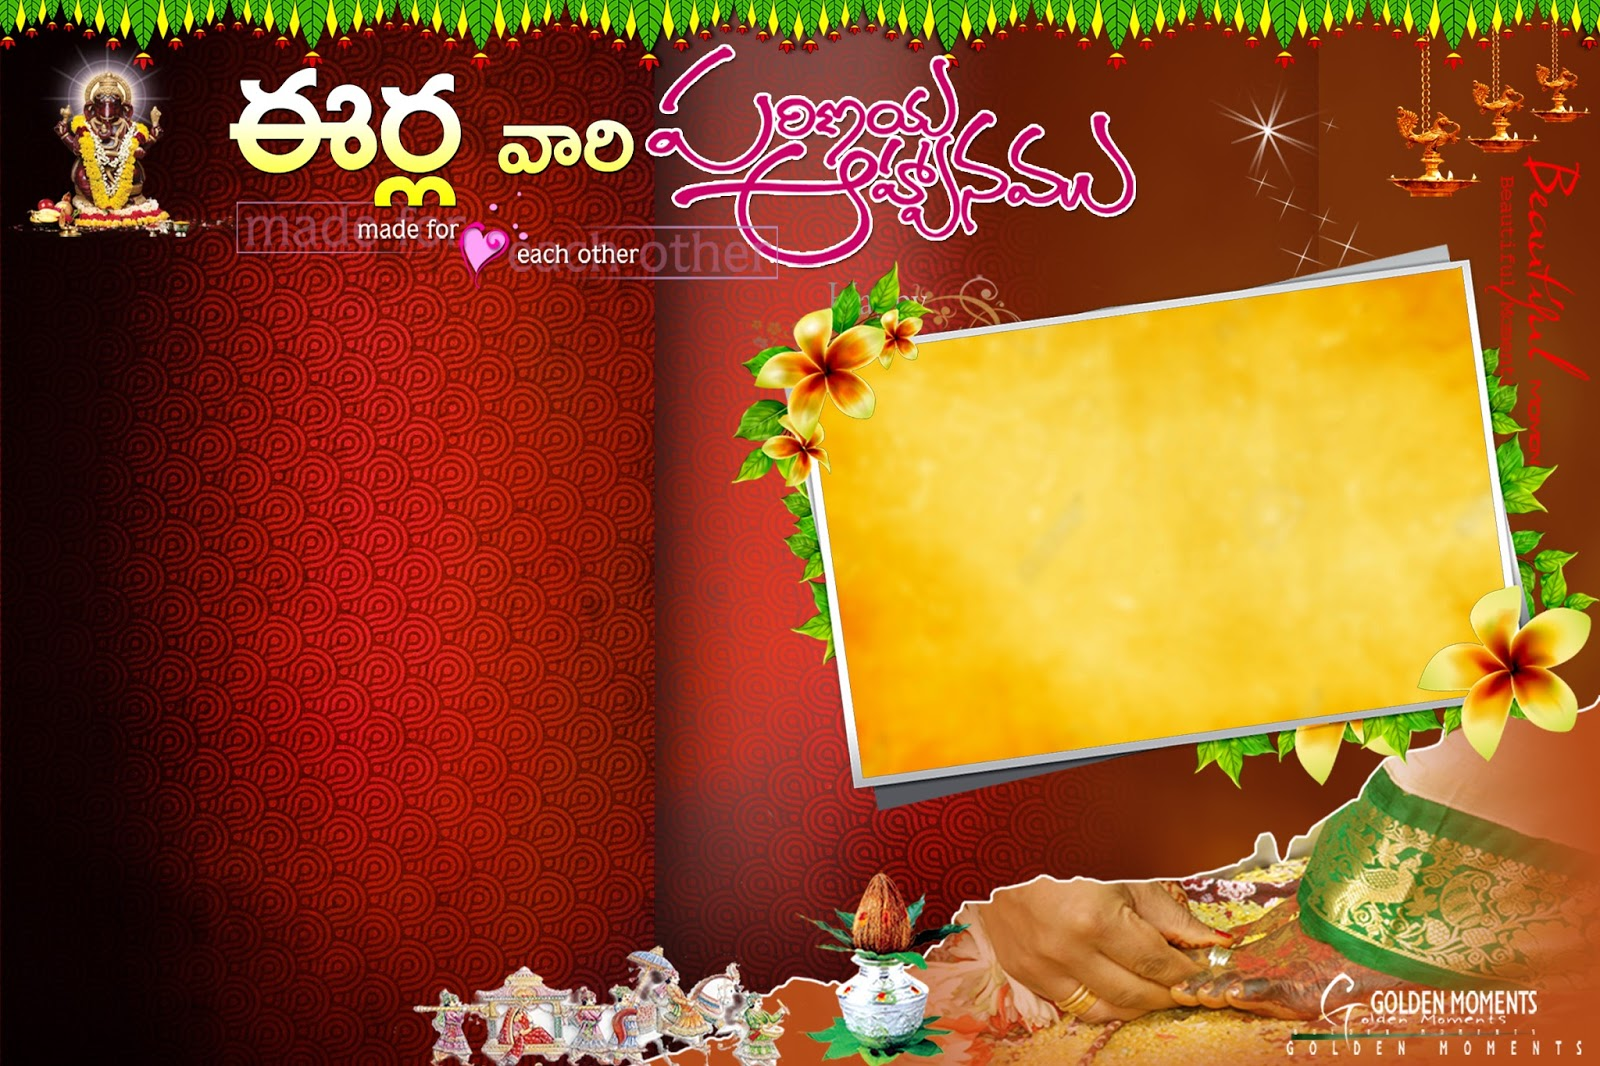 Photoshop Design In Tamil